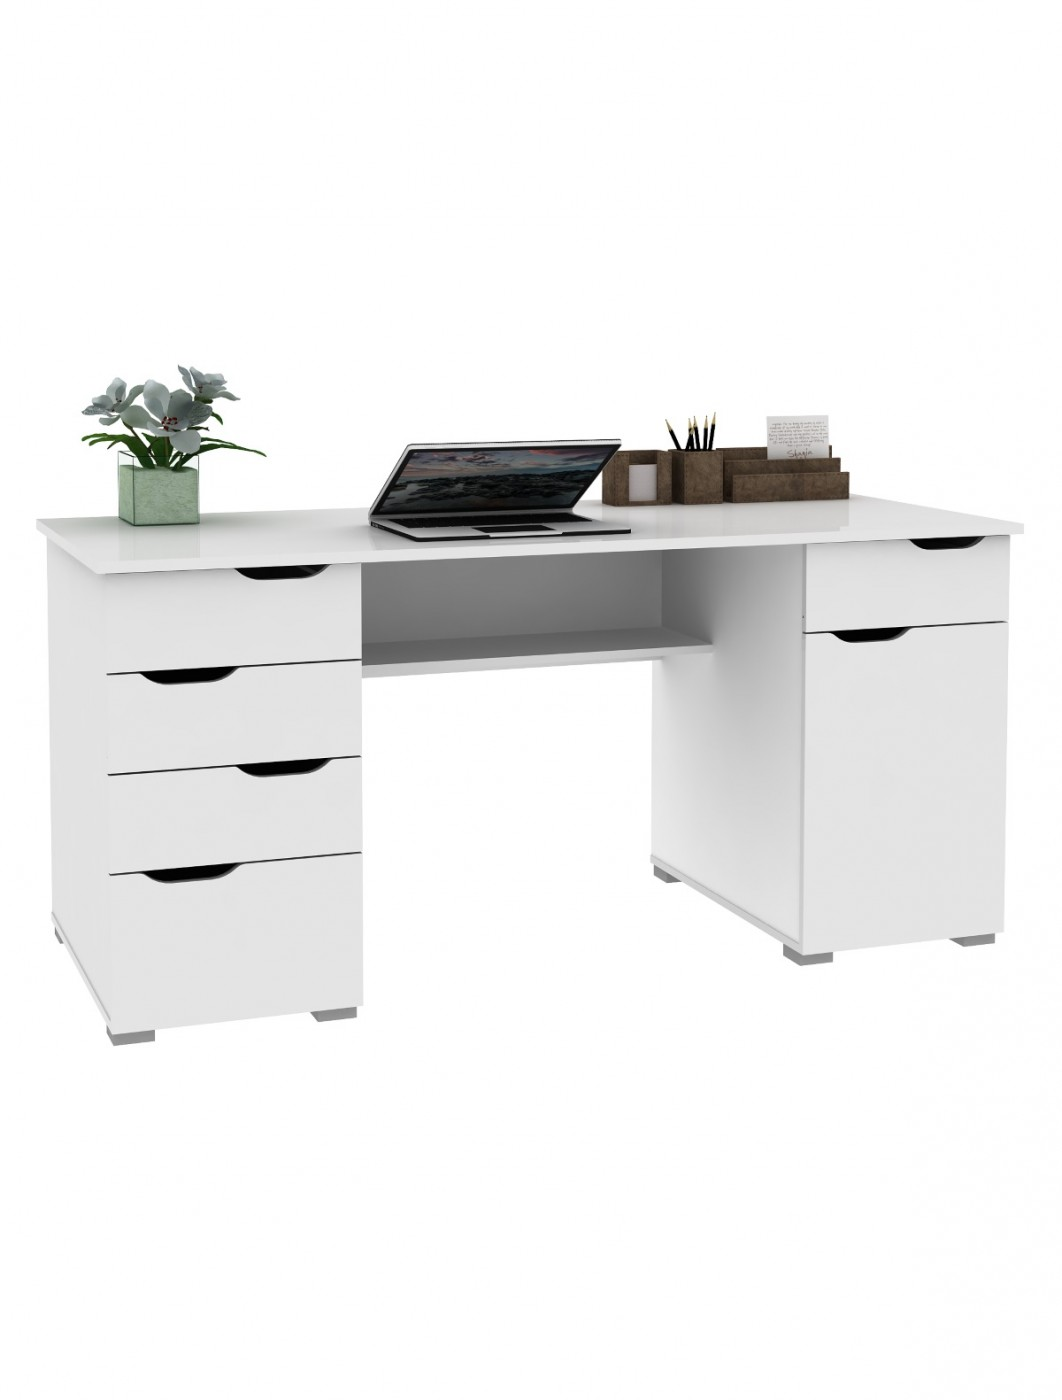 Swell Home Office Desks Alphason Kentucky Desk Aw1374Wht Home Interior And Landscaping Pimpapssignezvosmurscom